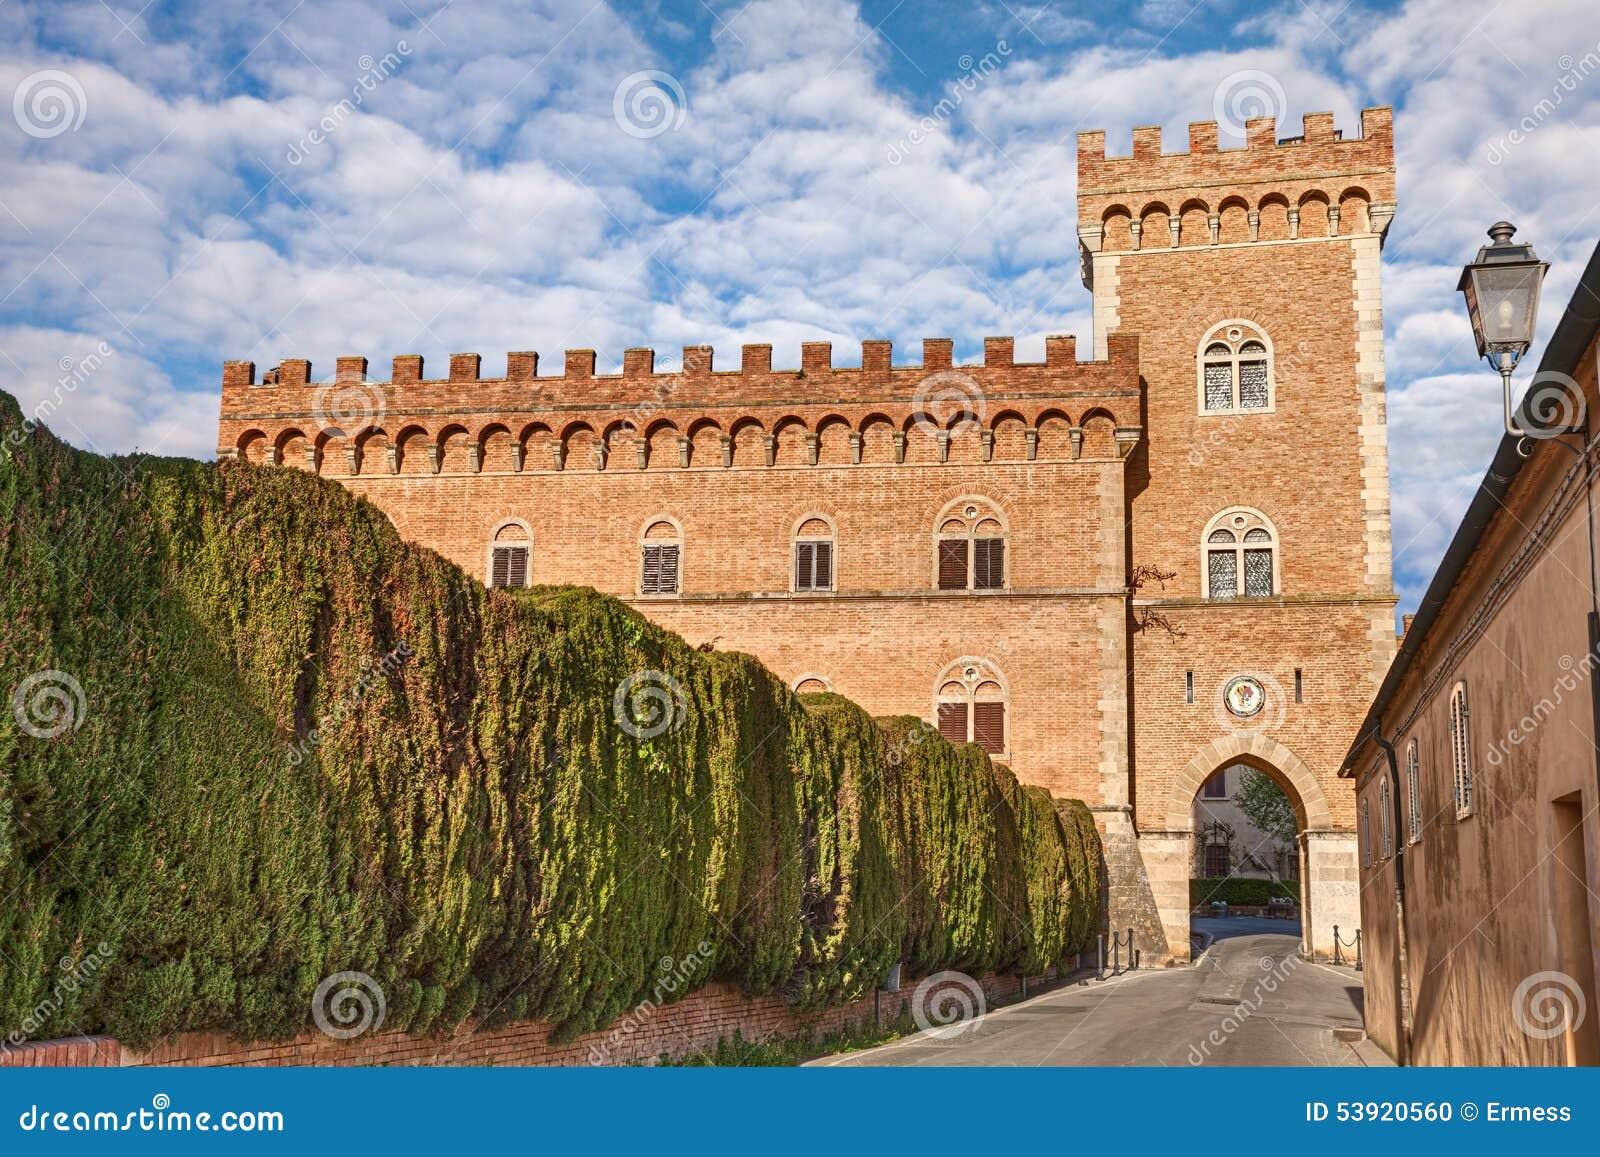 Castle of Bolgheri in Tuscany, Italy